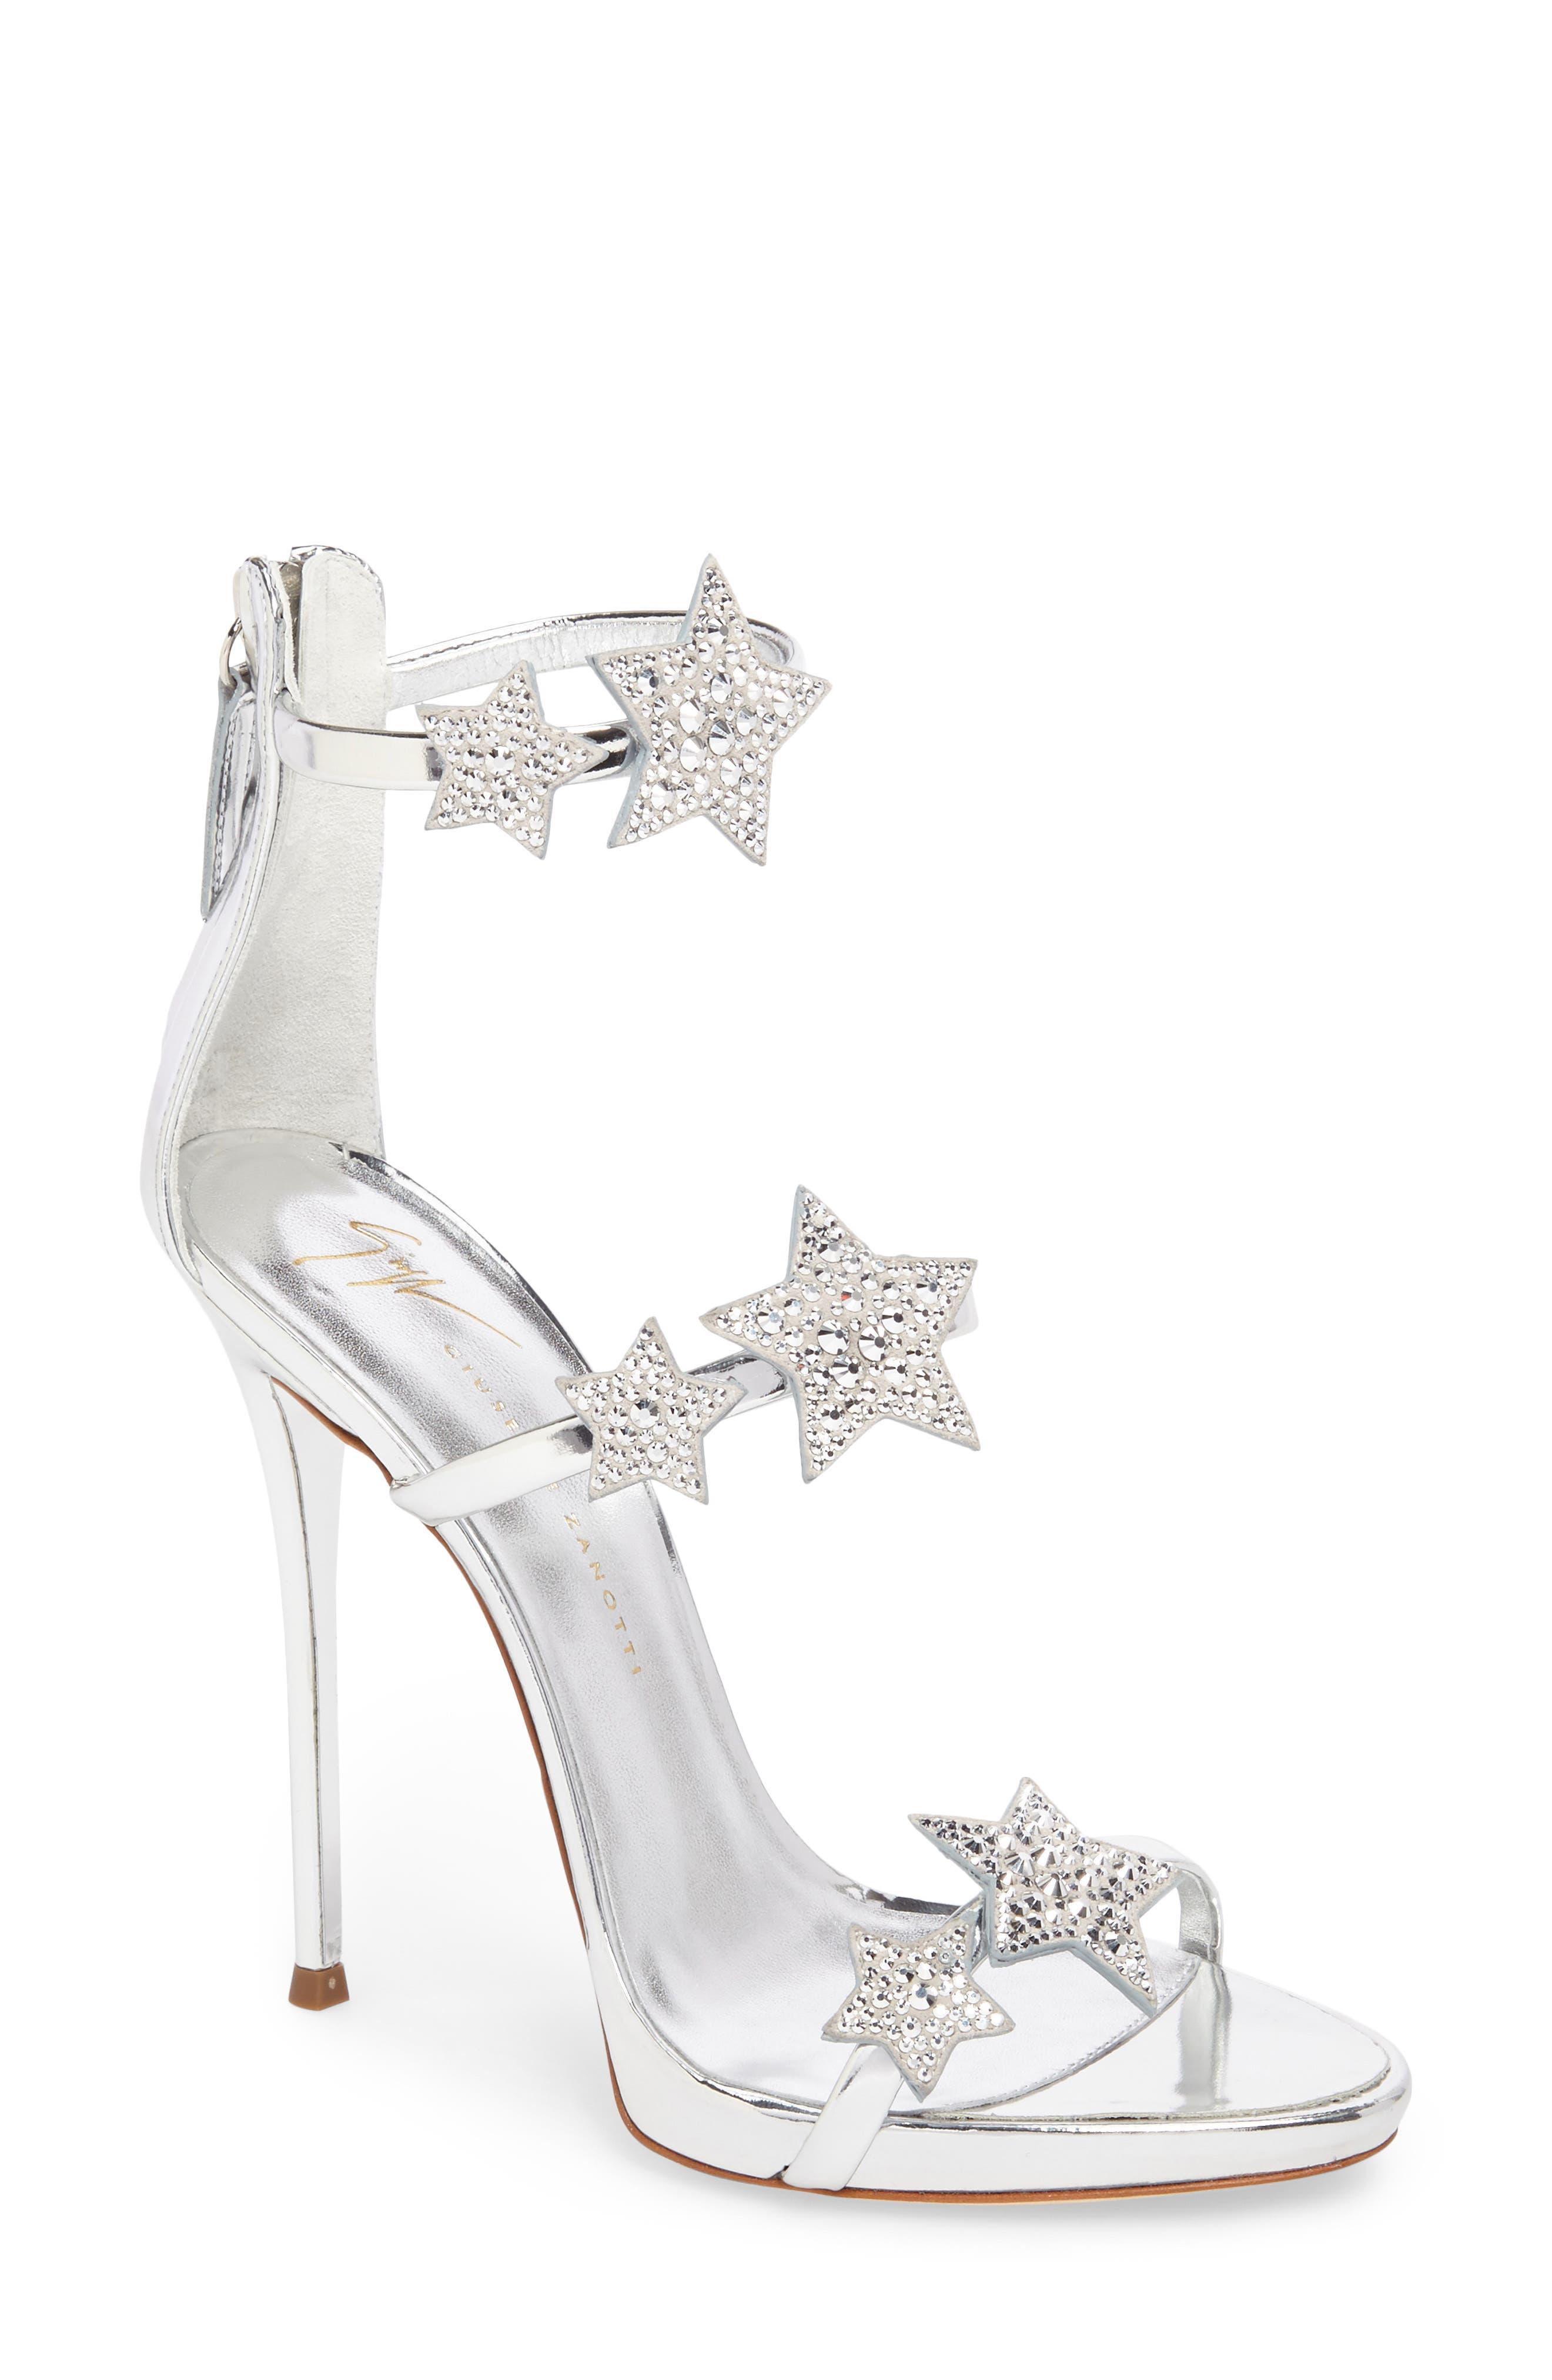 Alternate Image 1 Selected - Giuseppe Zanotti Coline Embellished Star Strap Sandal (Women)